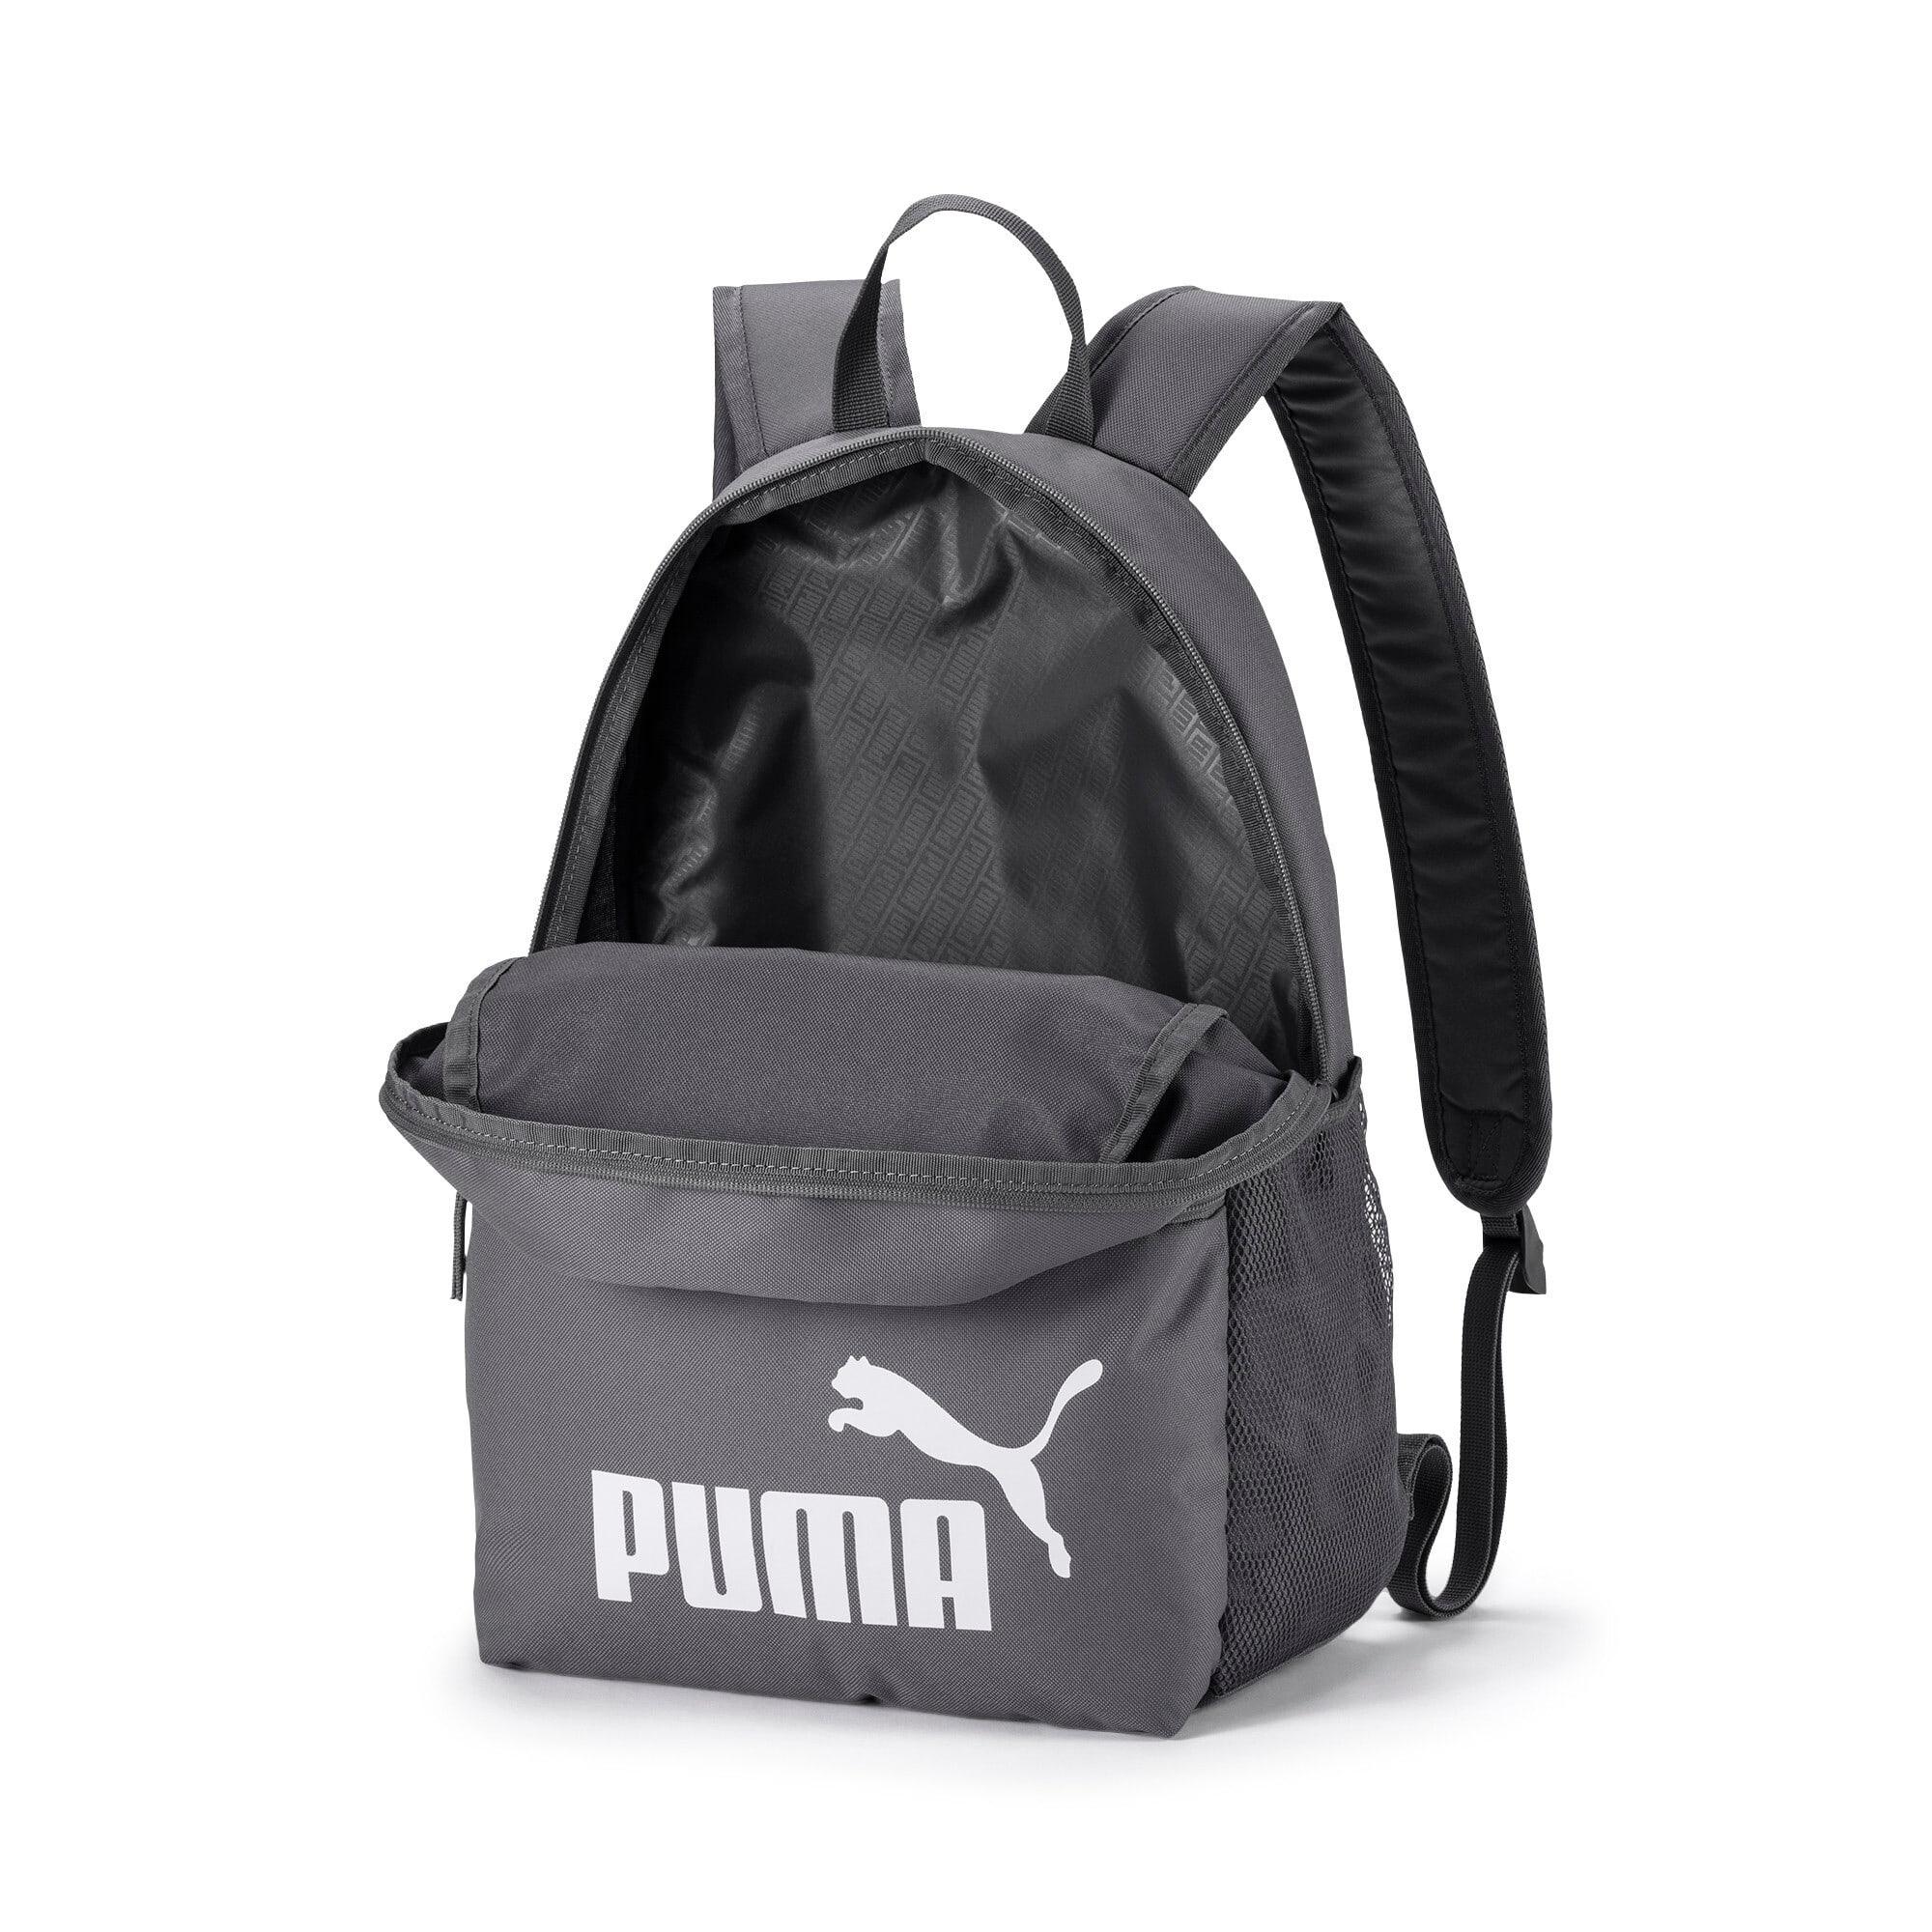 Thumbnail 3 of Phase Backpack, CASTLEROCK, medium